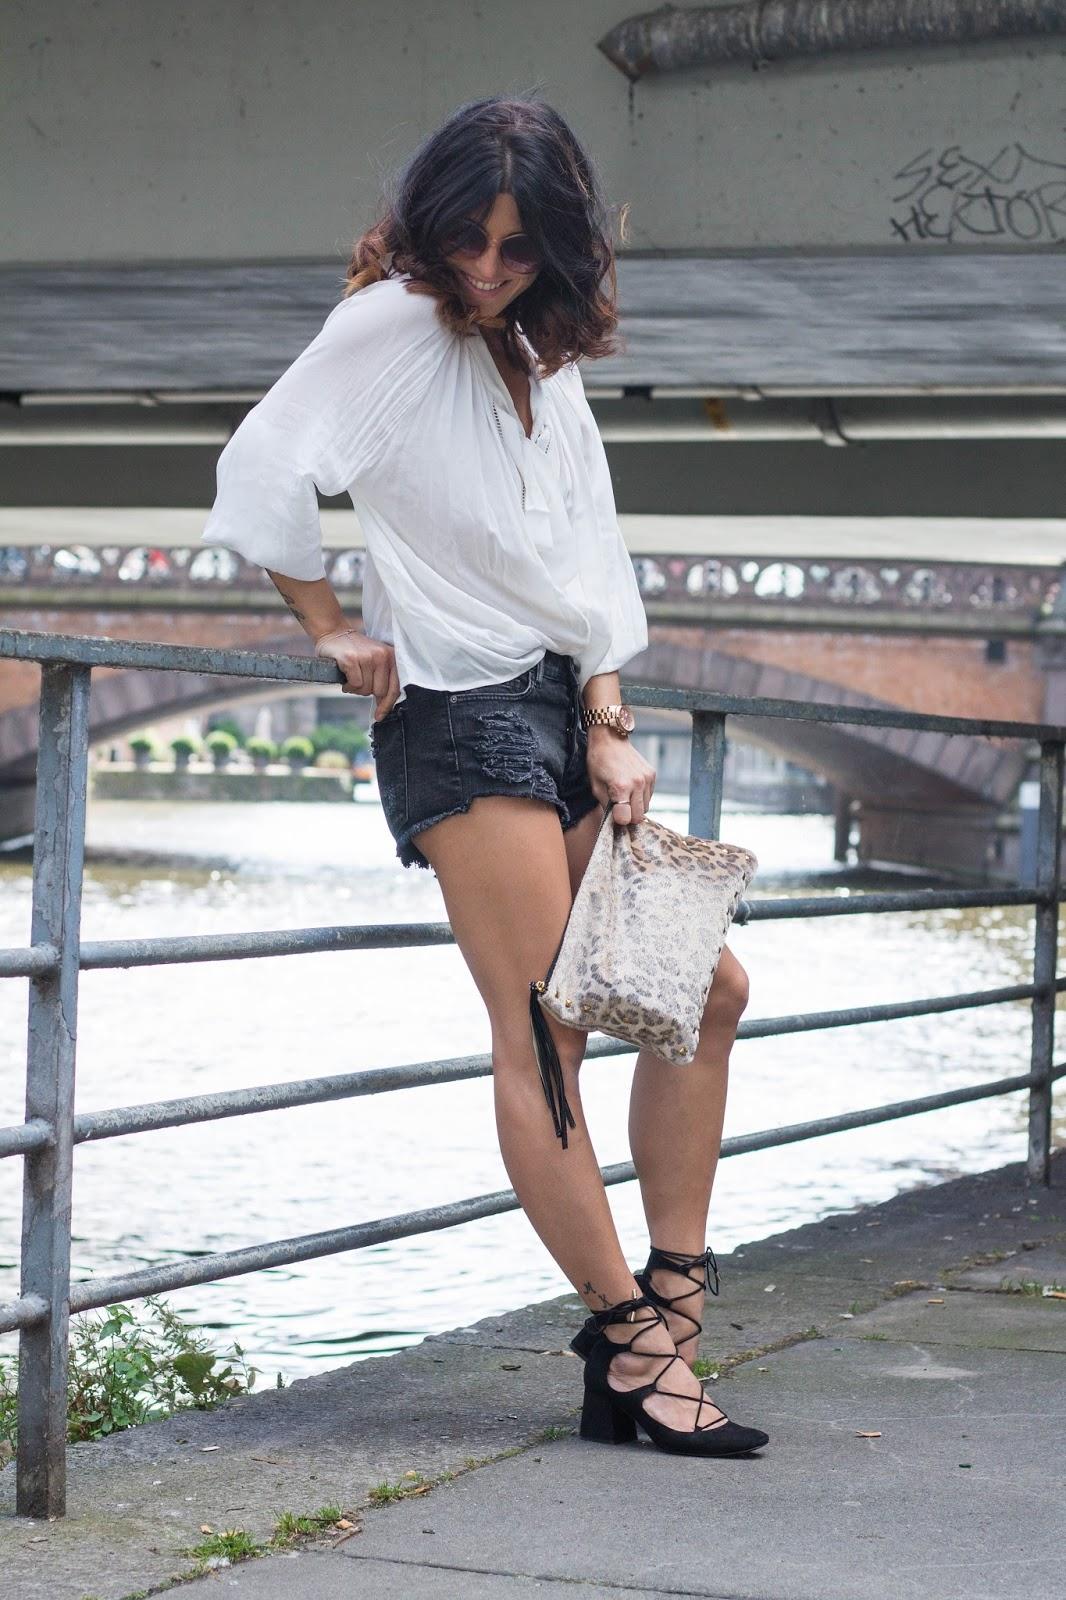 http://fashionavenueabc.blogspot.de/2016/08/b.html